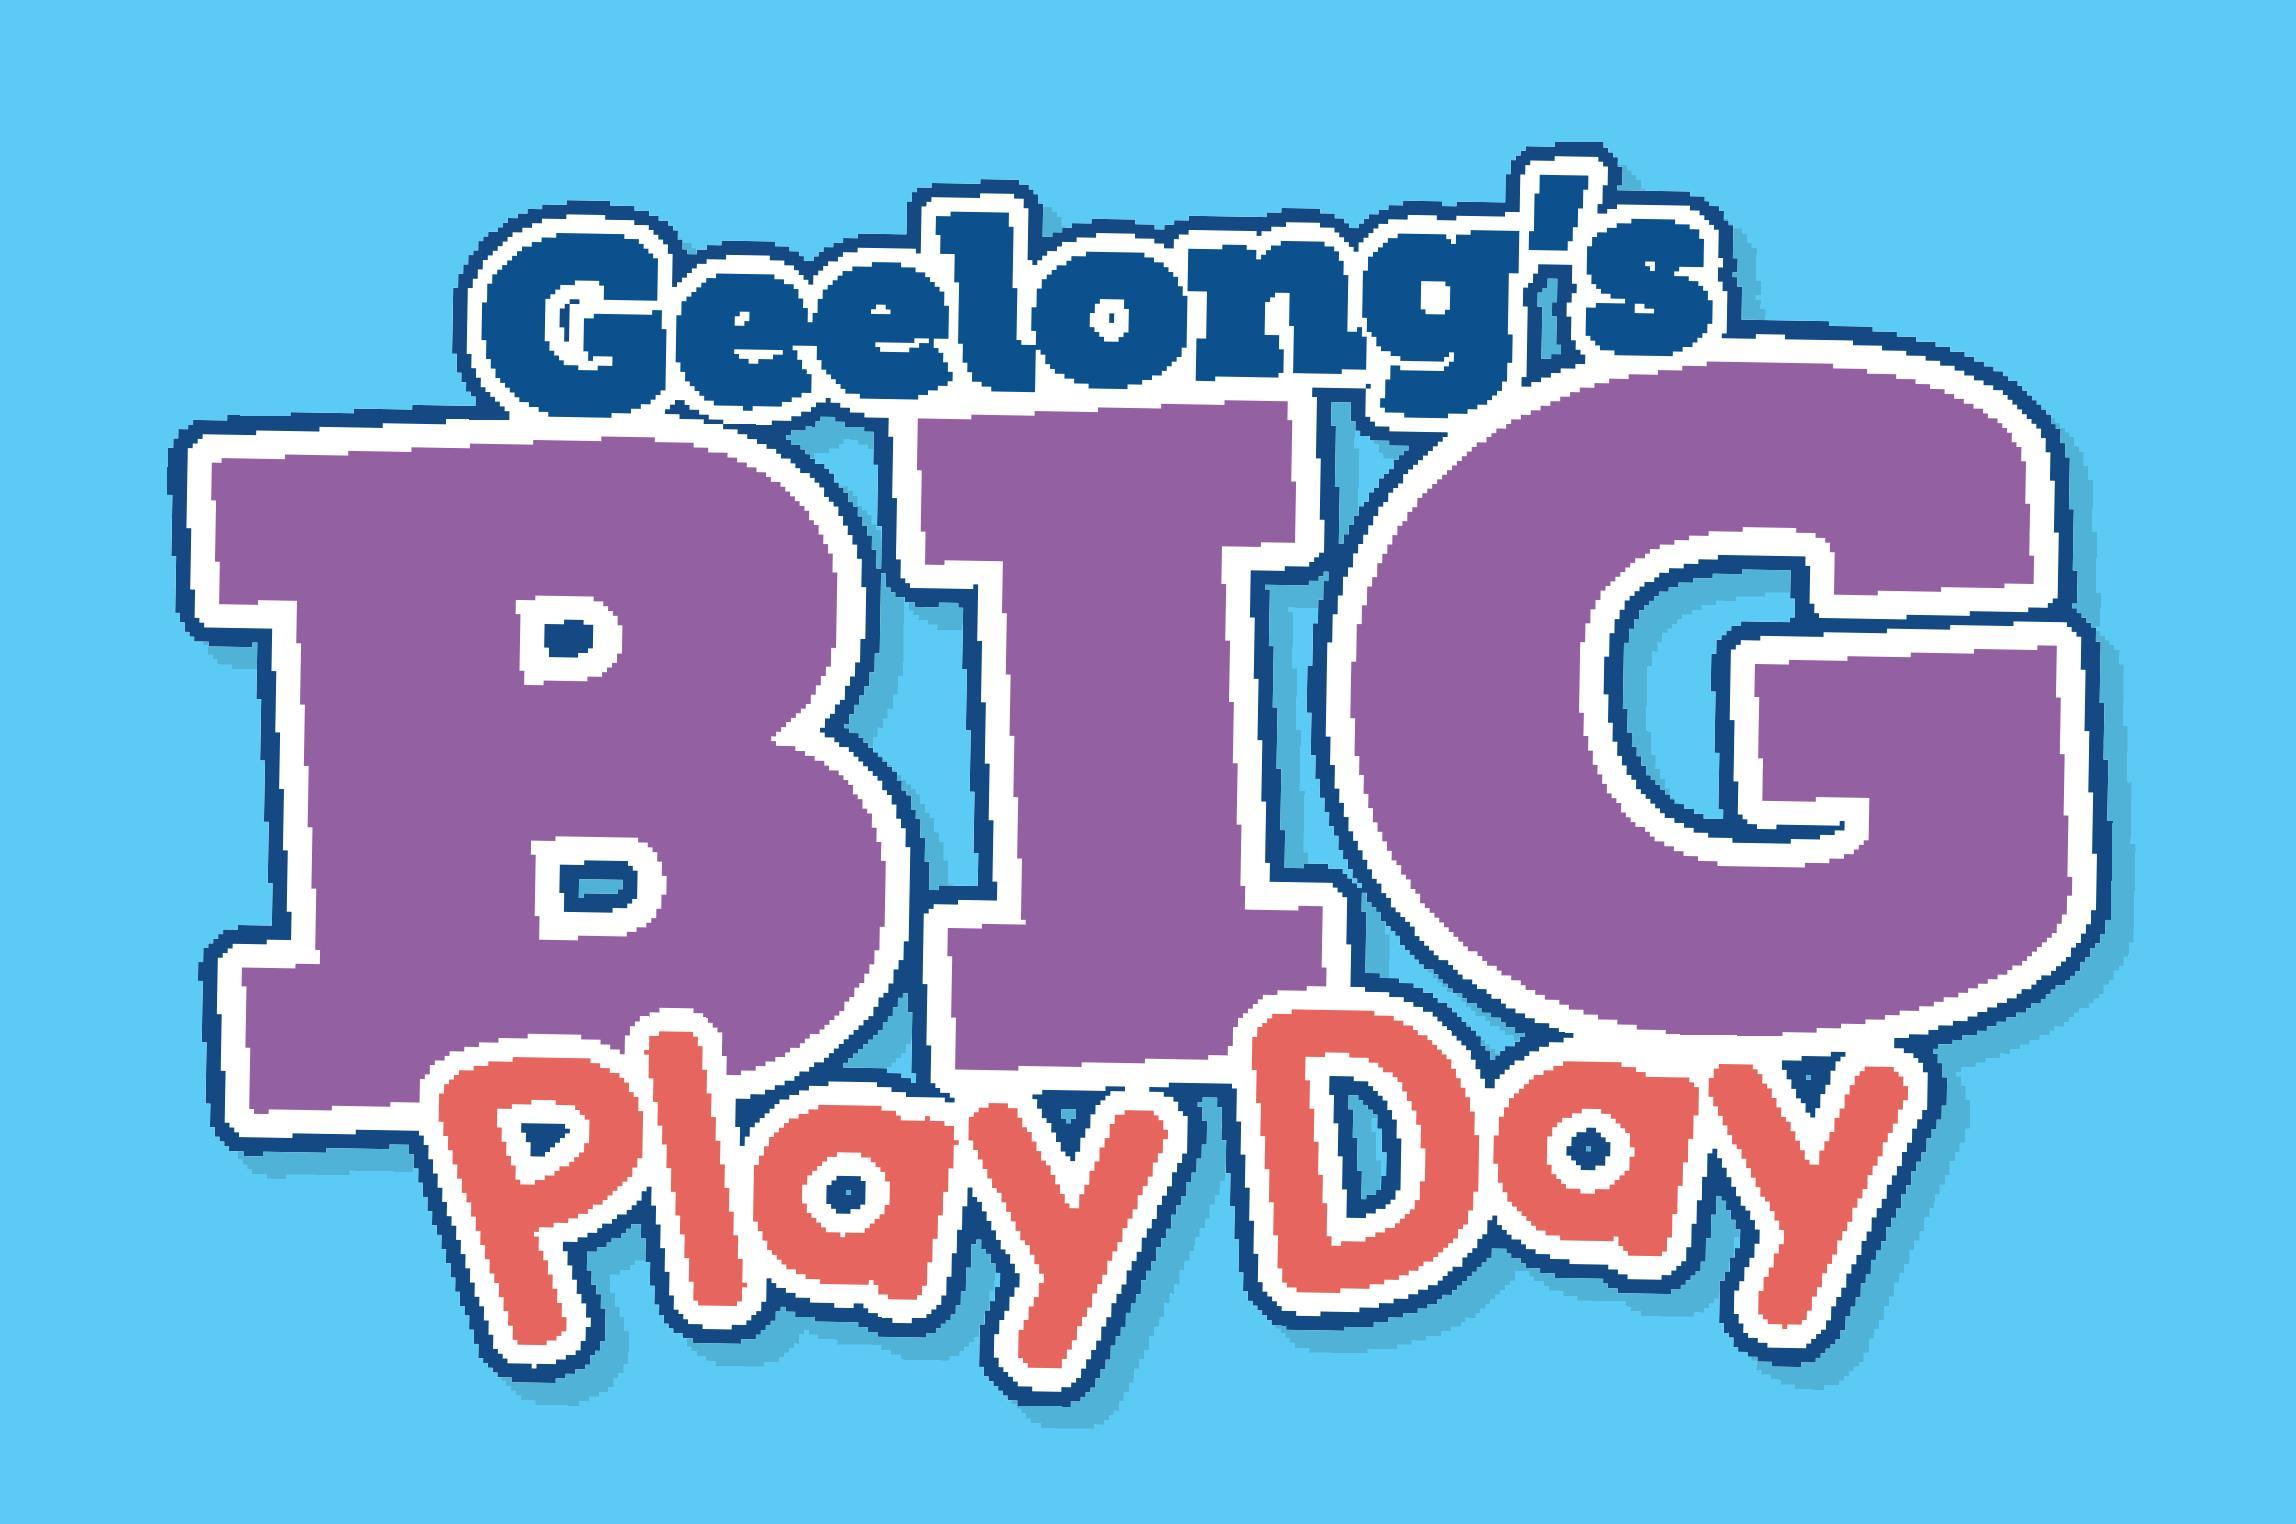 Geelong's Big Play Day 2020